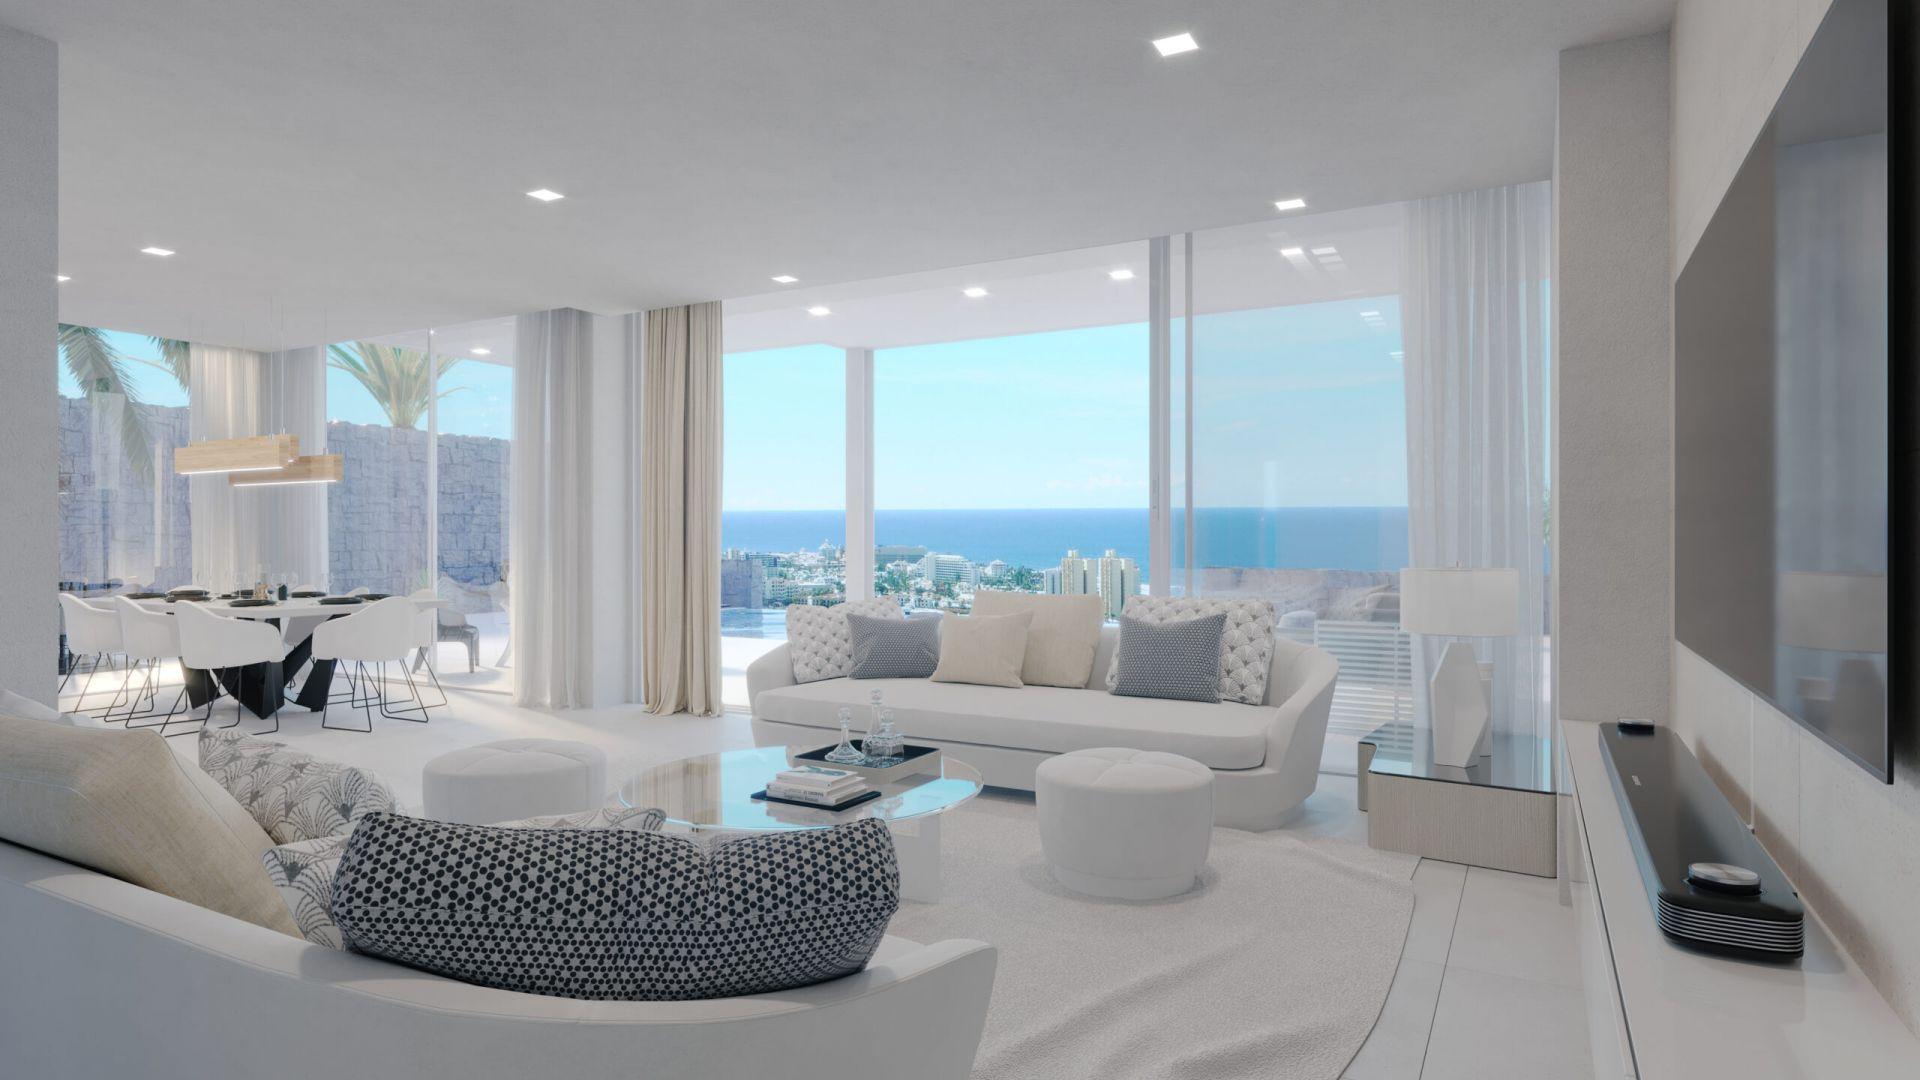 Serenity Luxury Villas Tenerife - img 6.